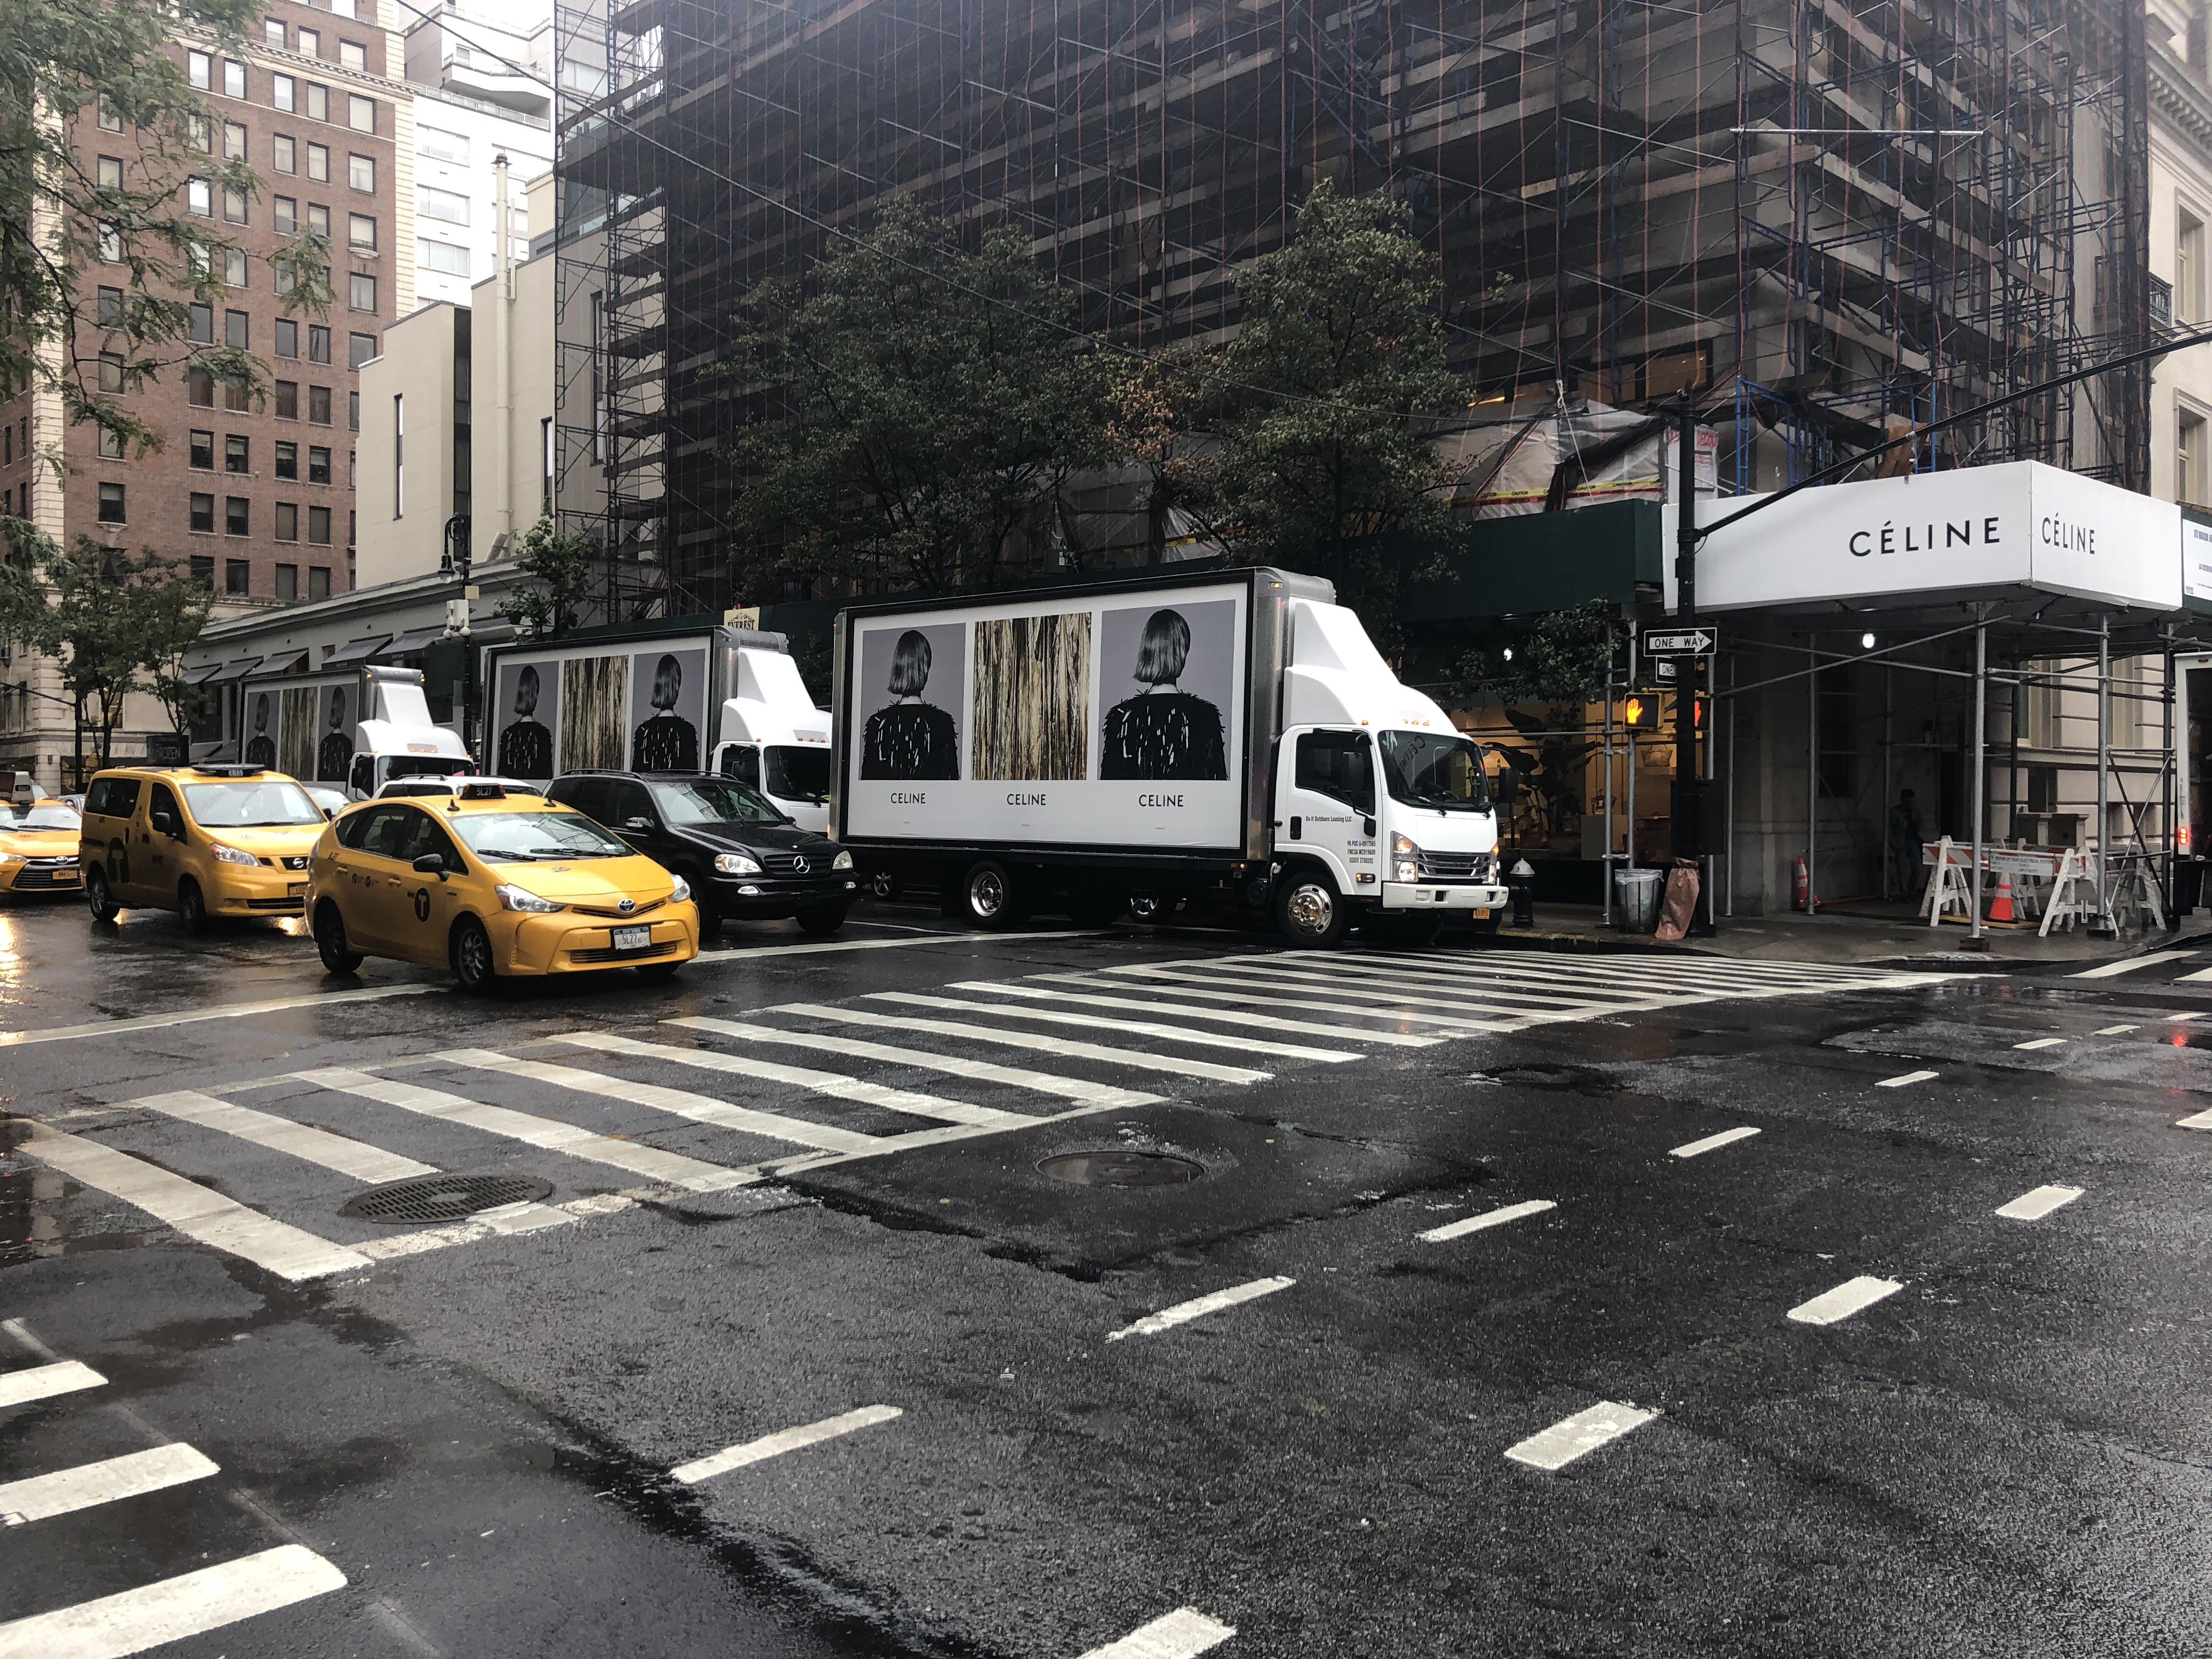 mobile billboards in New York City